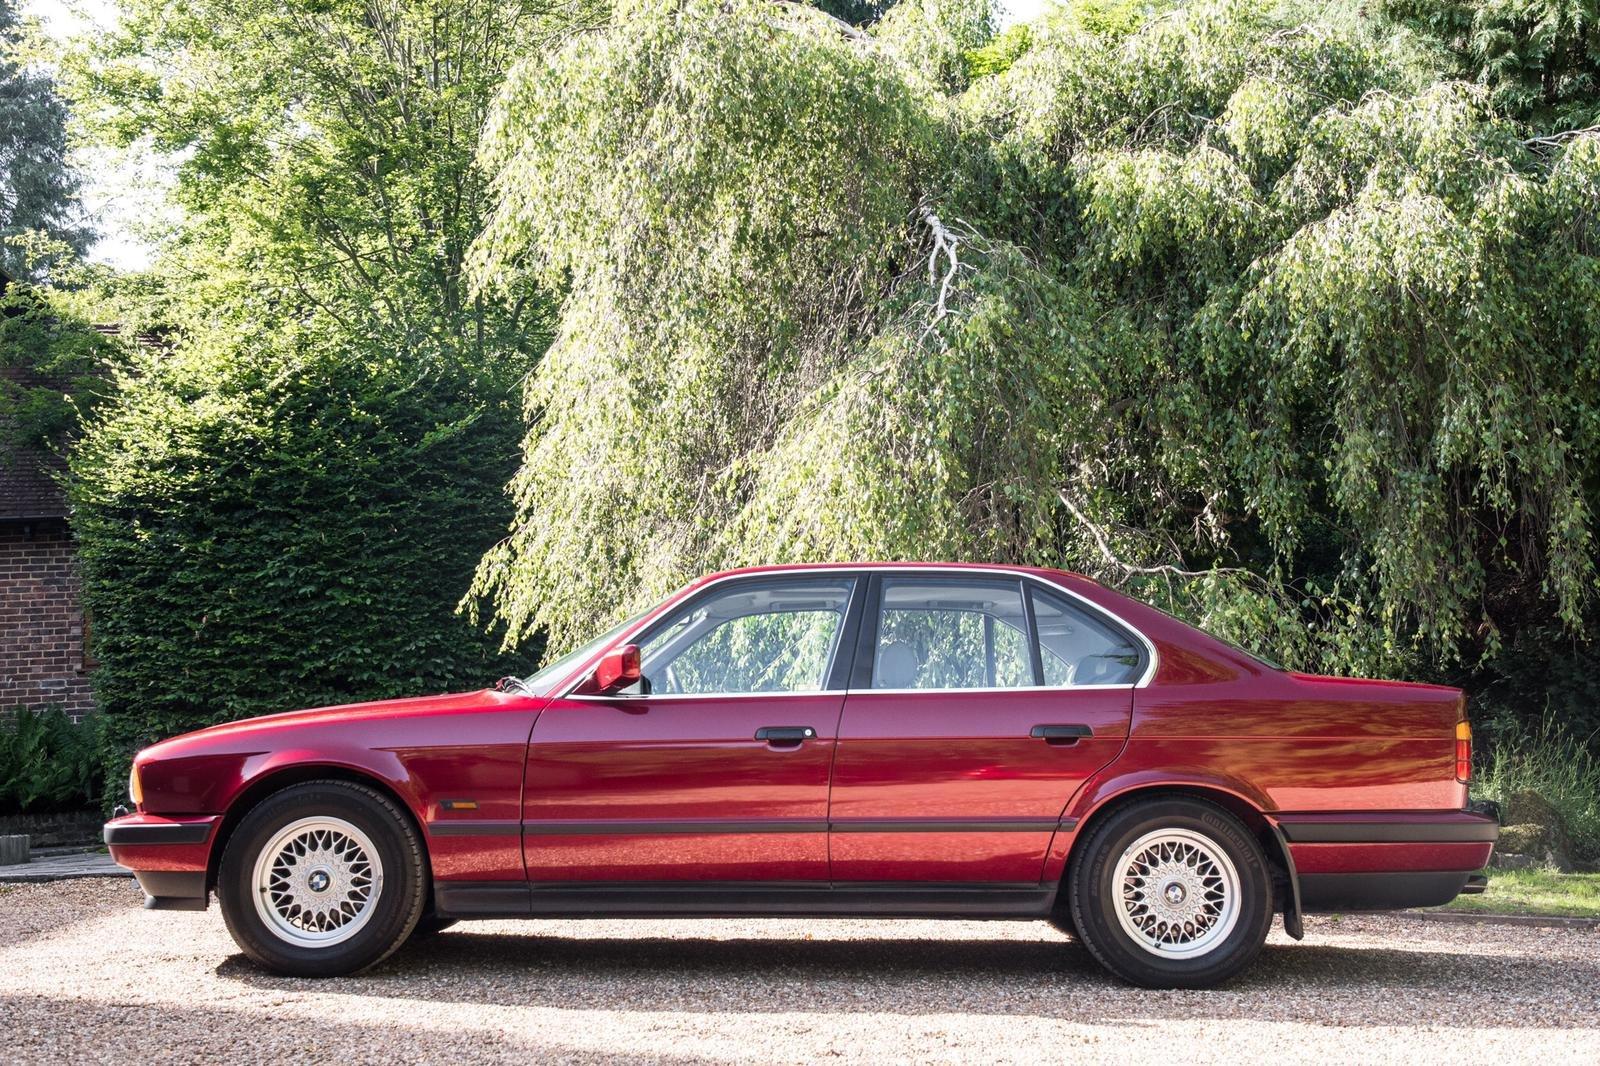 1990 BMW E34 535i SE Low Mileage For Sale (picture 2 of 6)